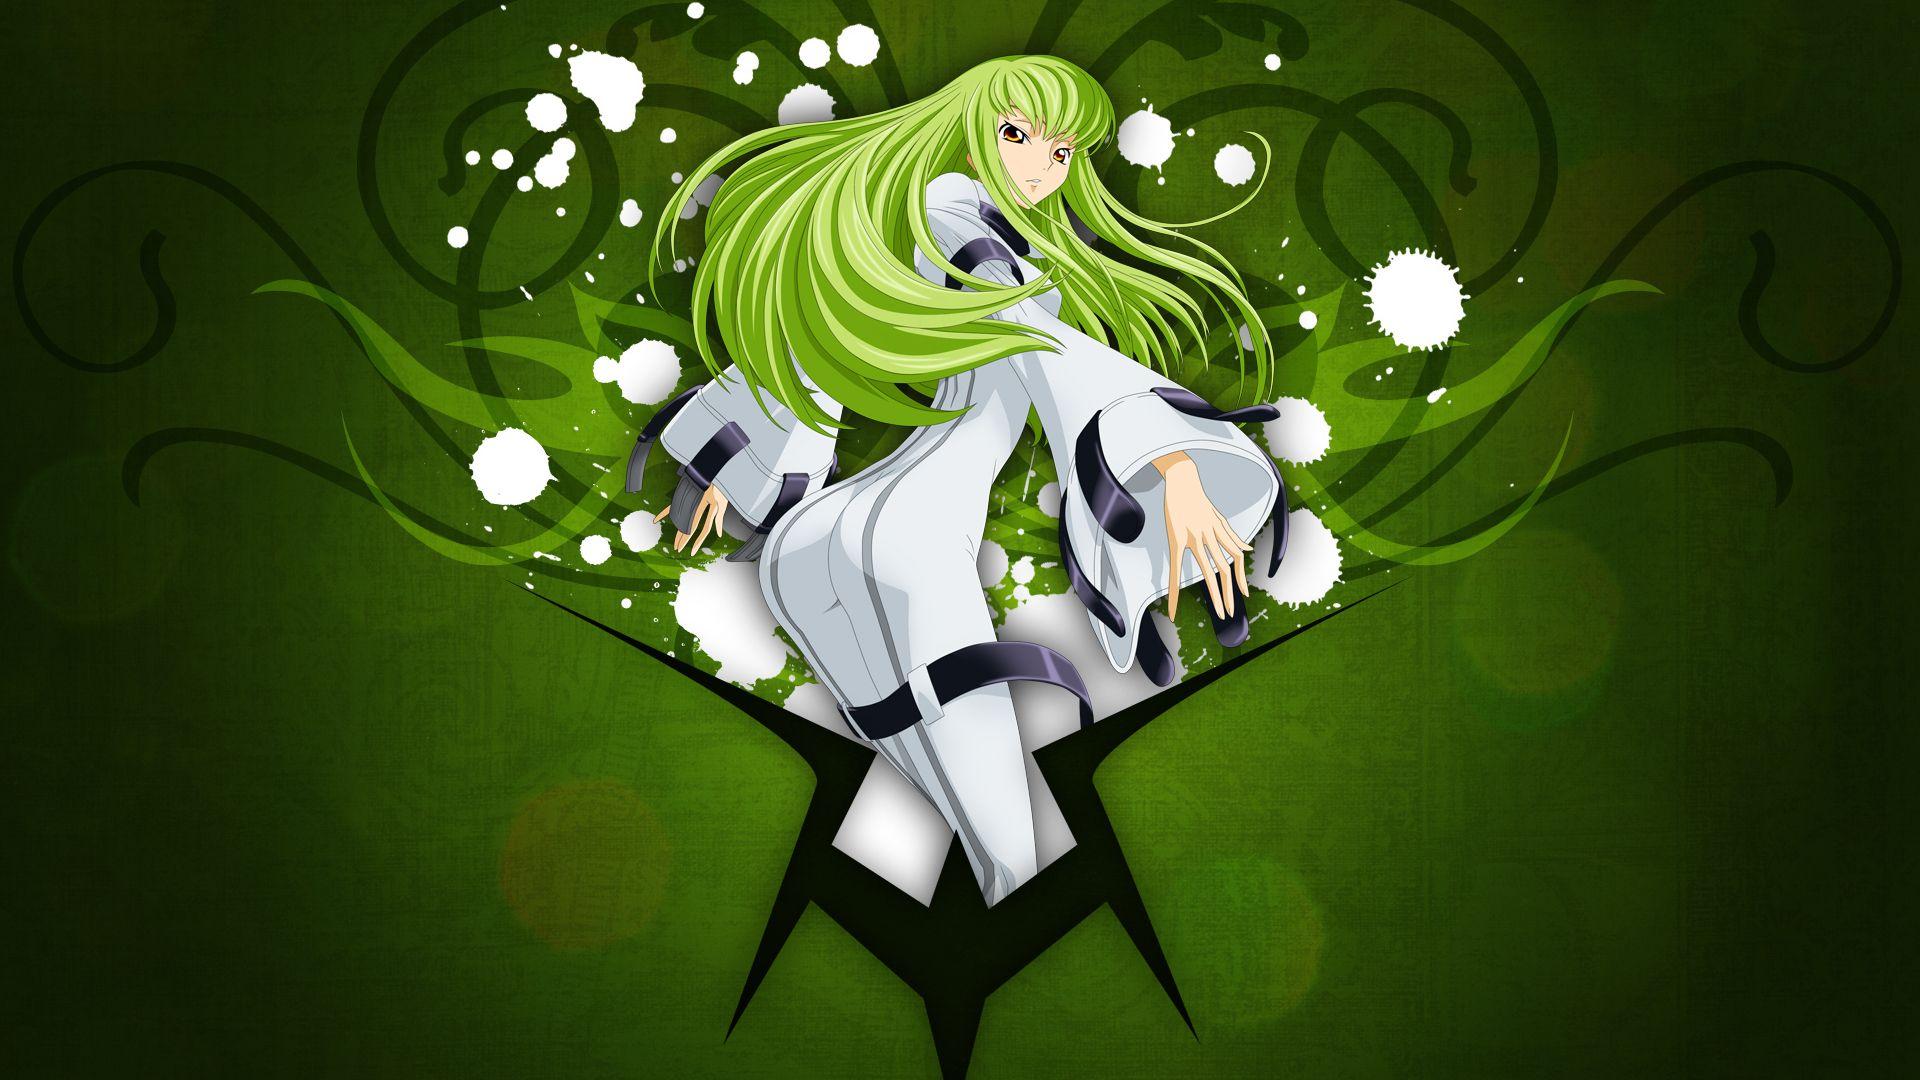 Green Code Geass Green Hair C C Anime Hd Wallpapers